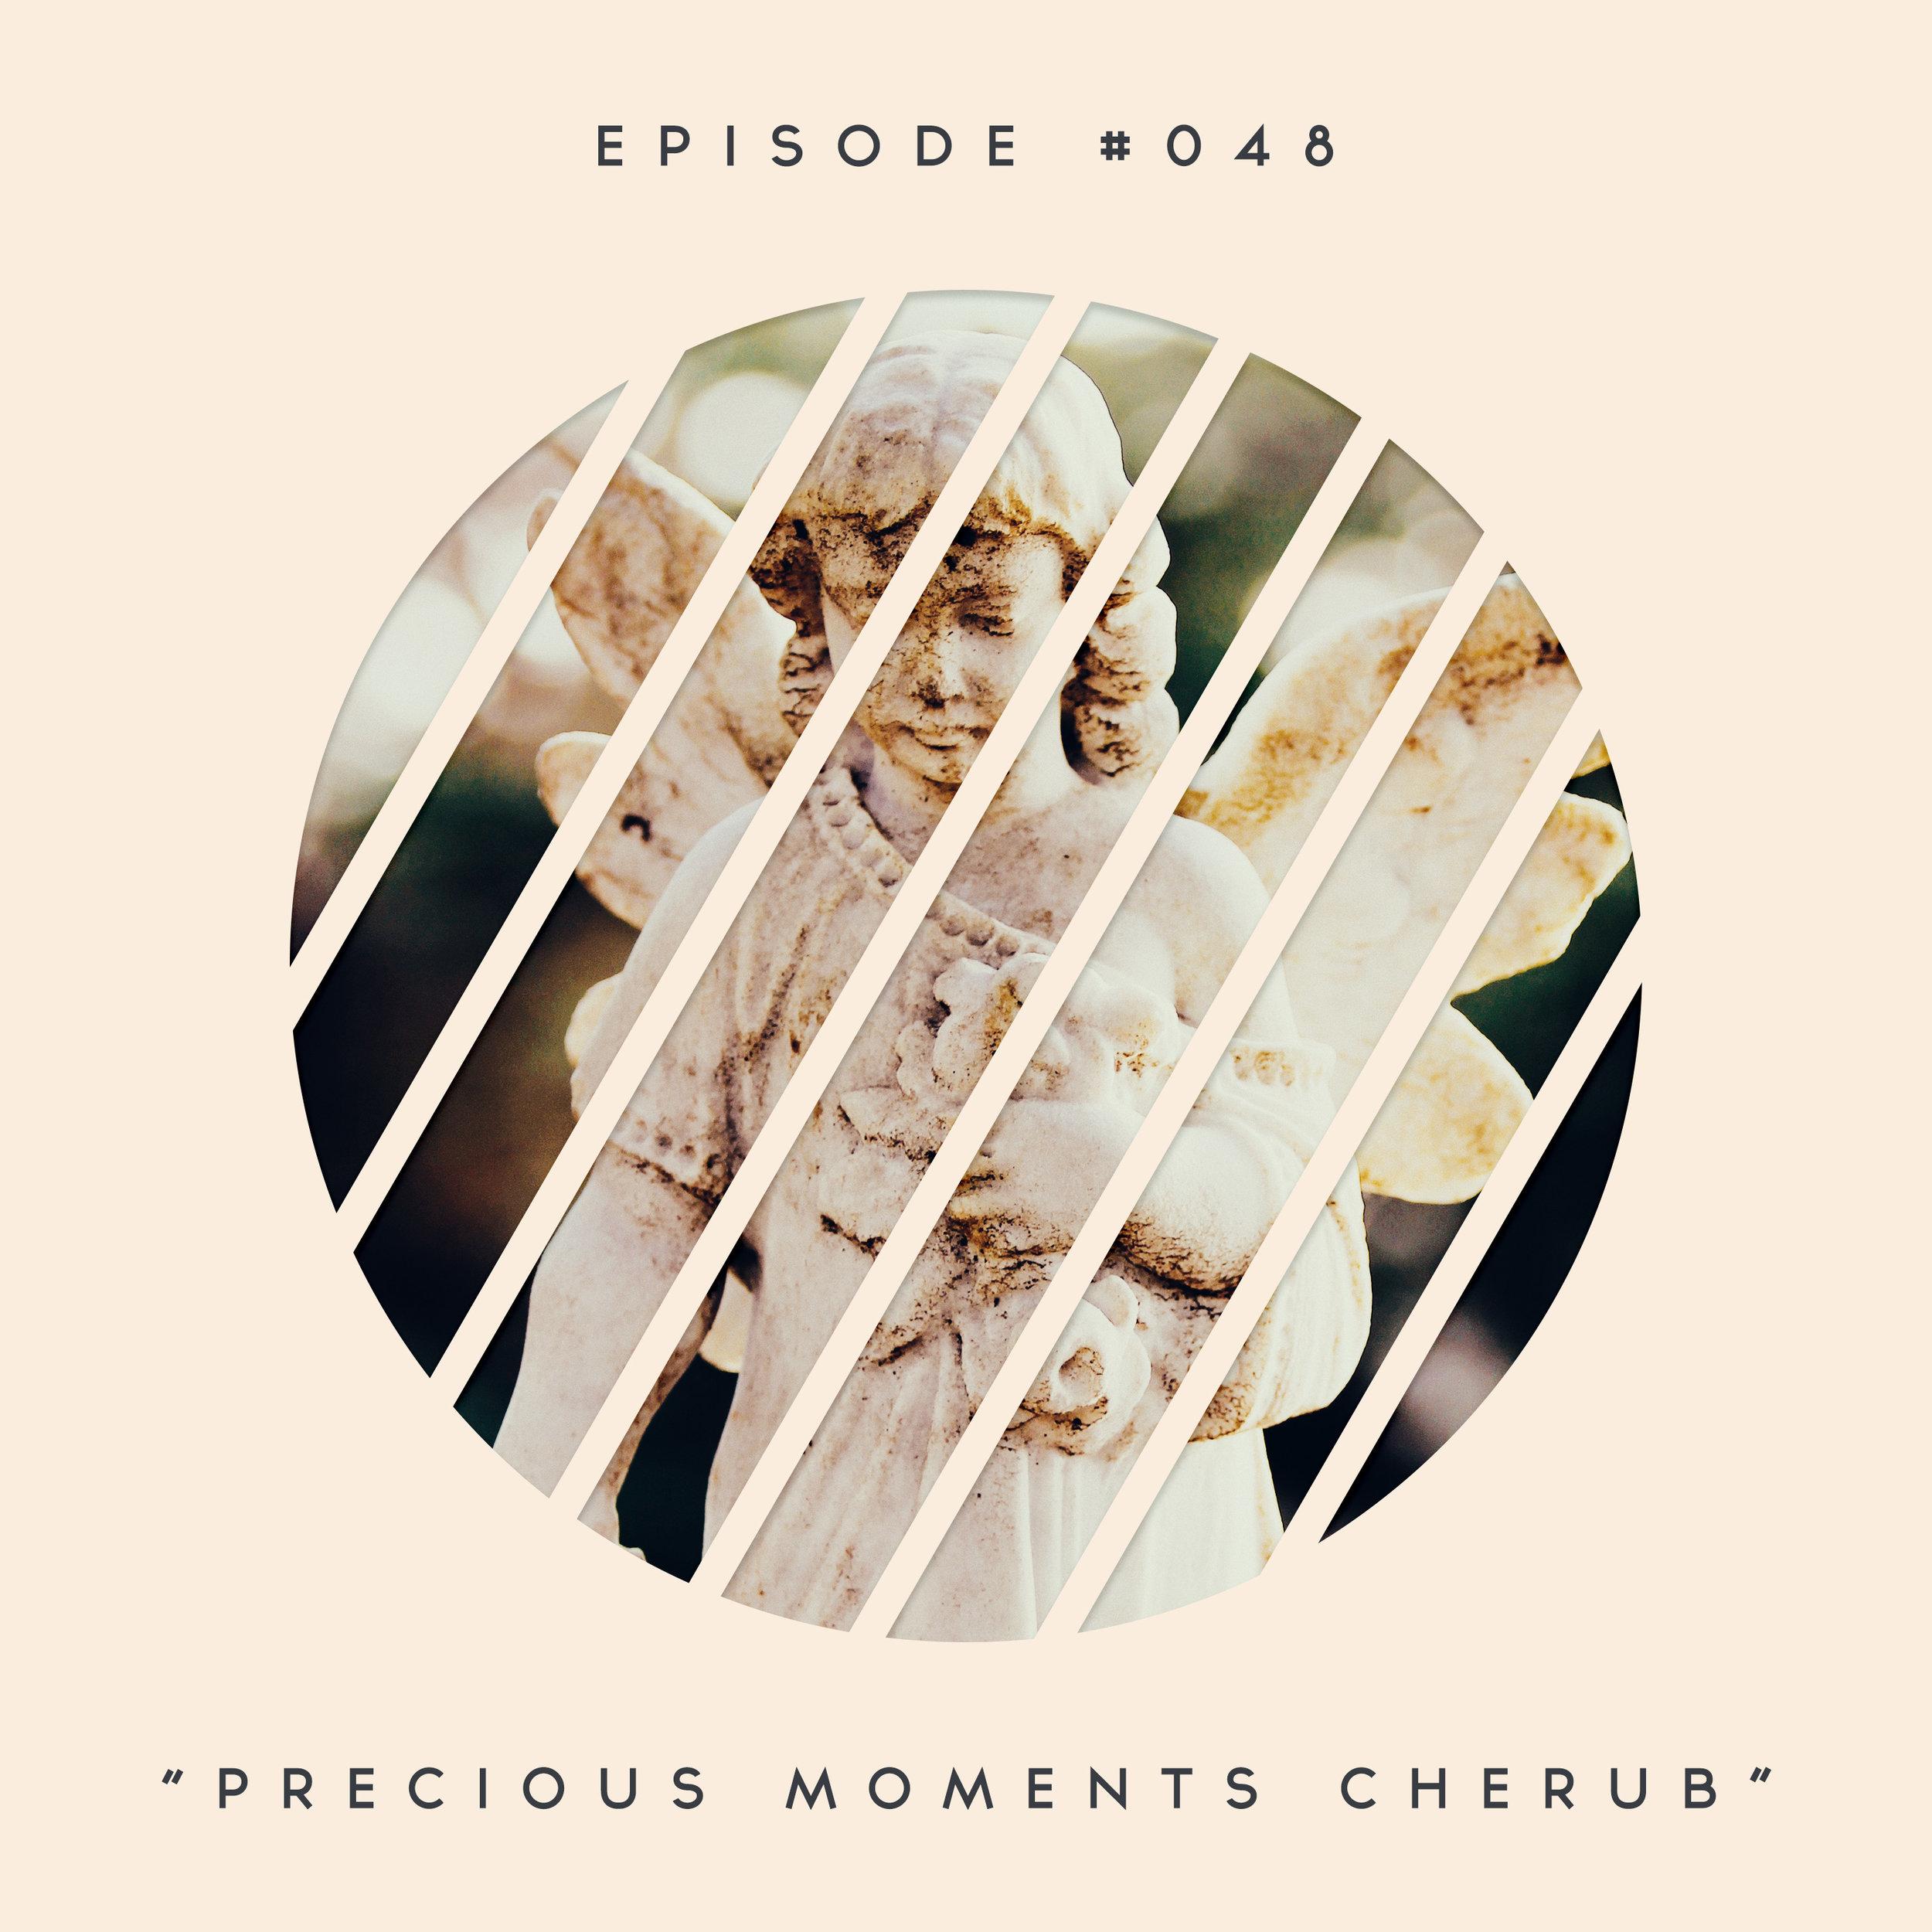 Precious-Moments-Cherub.jpg